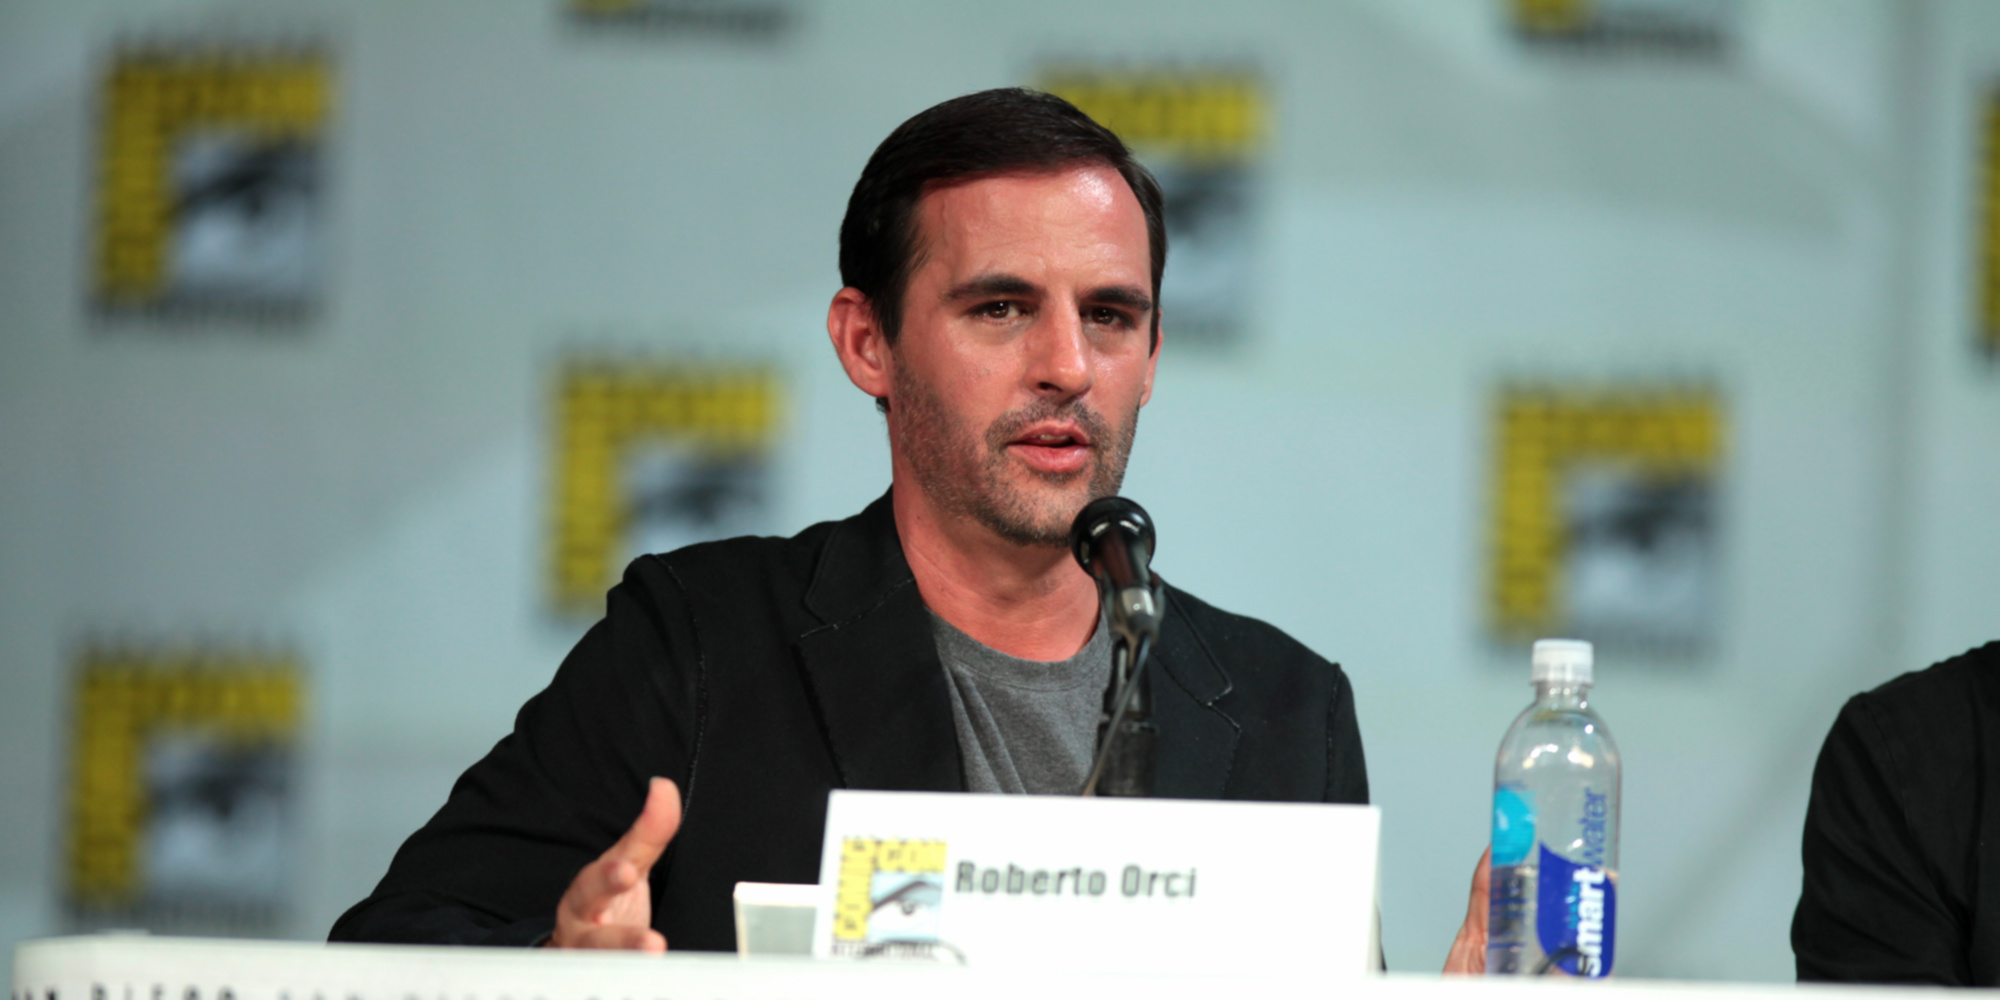 Star Trek's Roberto Orci to Produce Galaga Animated Series